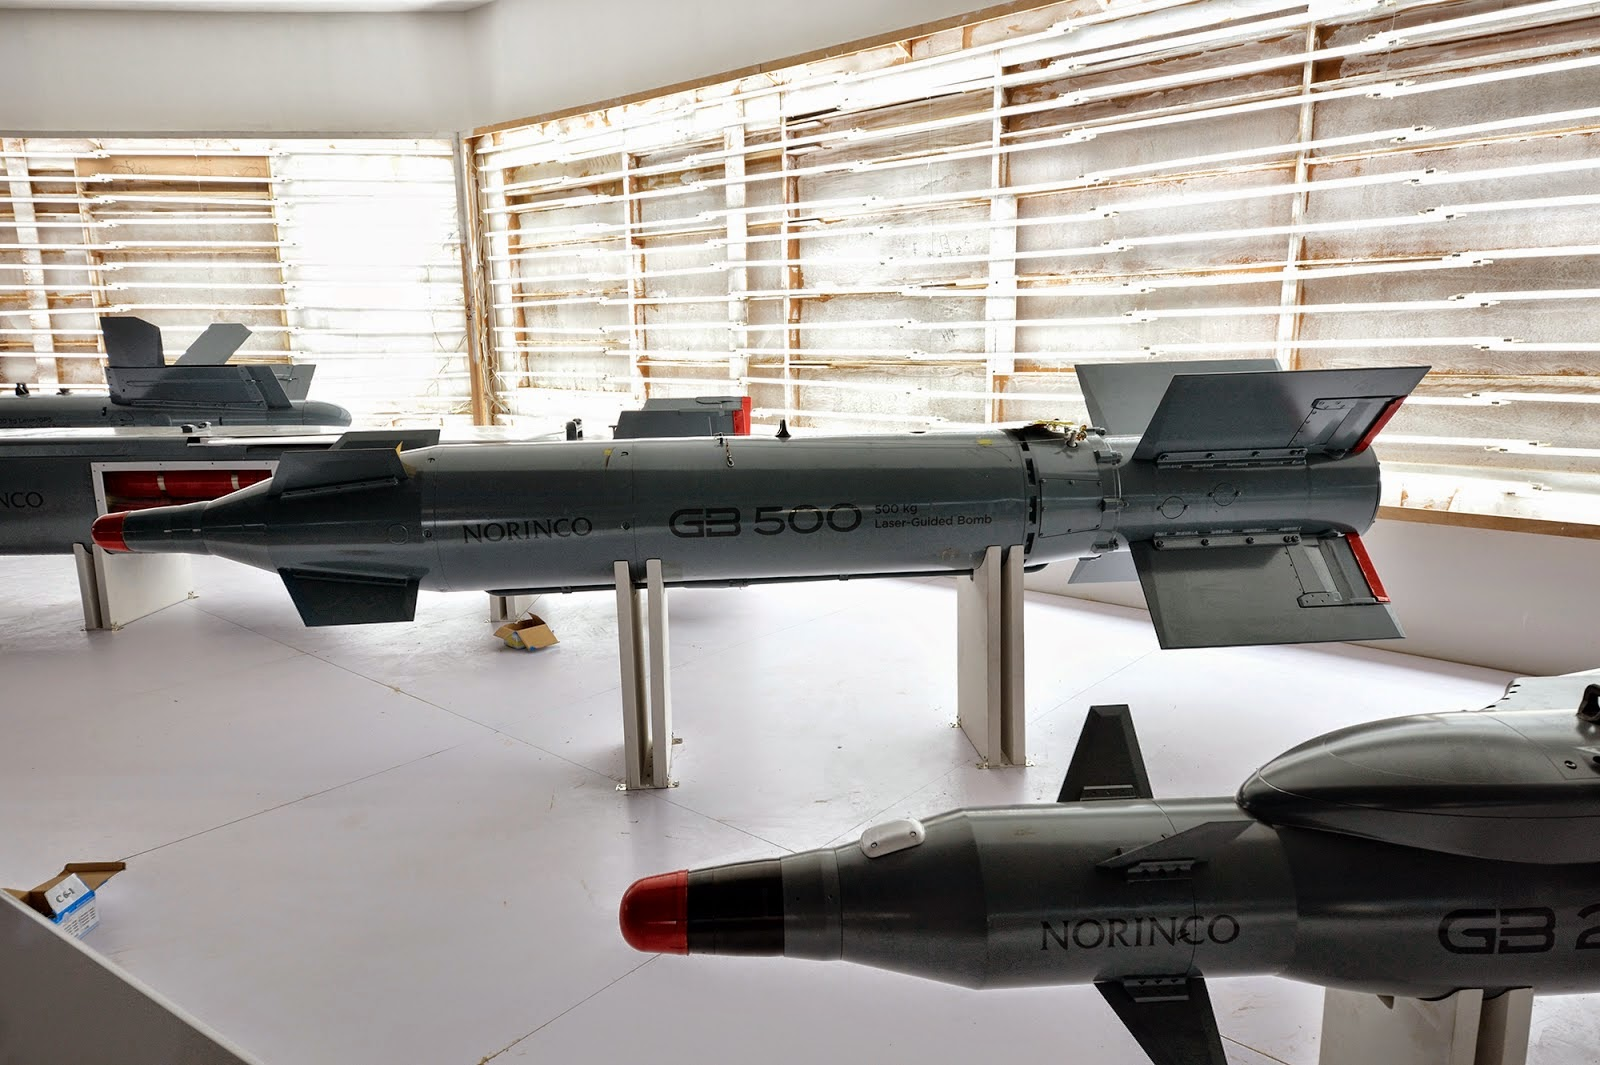 Zhuhai 2014 (11 au 16 Novembre) -  Airshow China 2014      Norinco%2BAir-Launched%2BWeapons%2Bat%2Bdisplay%2Bin%2BZhuhai%2B%2BNorinco%2BGB%2B500%2BLaser%2BGPS%2Bguided%2Bbombs1